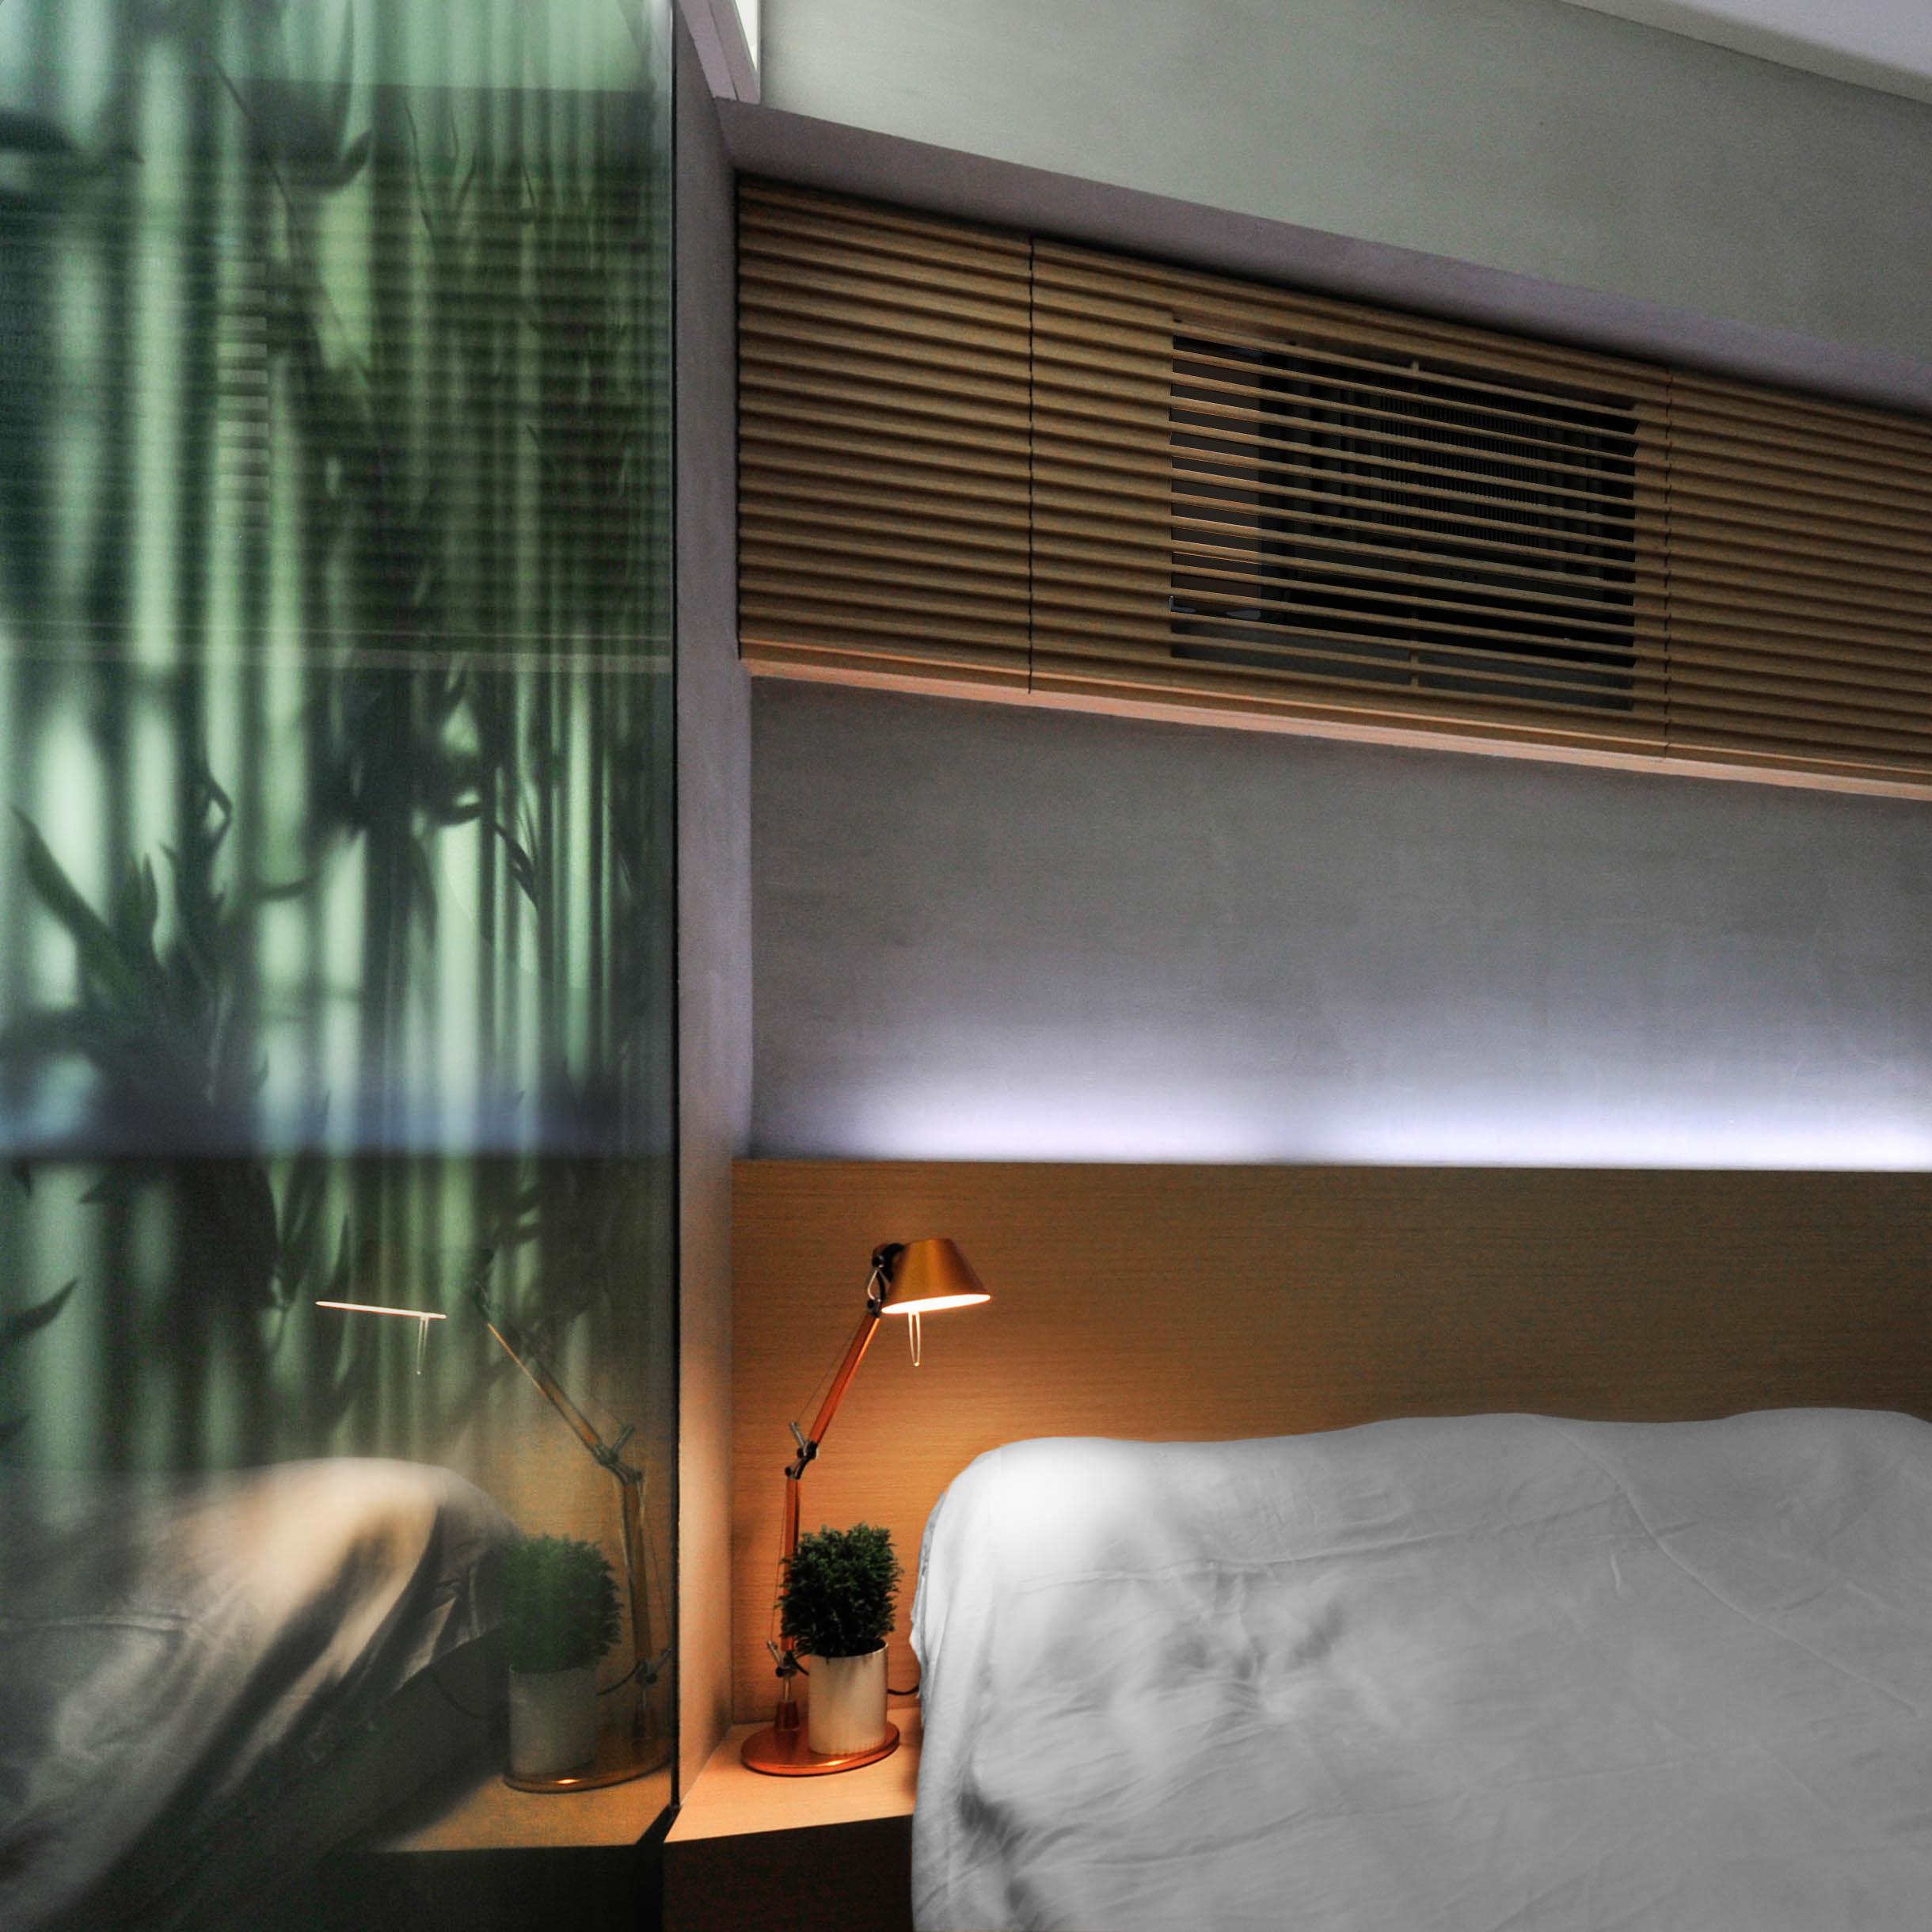 家居設計 Home Design hk  _綠_升級的家 Green within 600sqft (11)